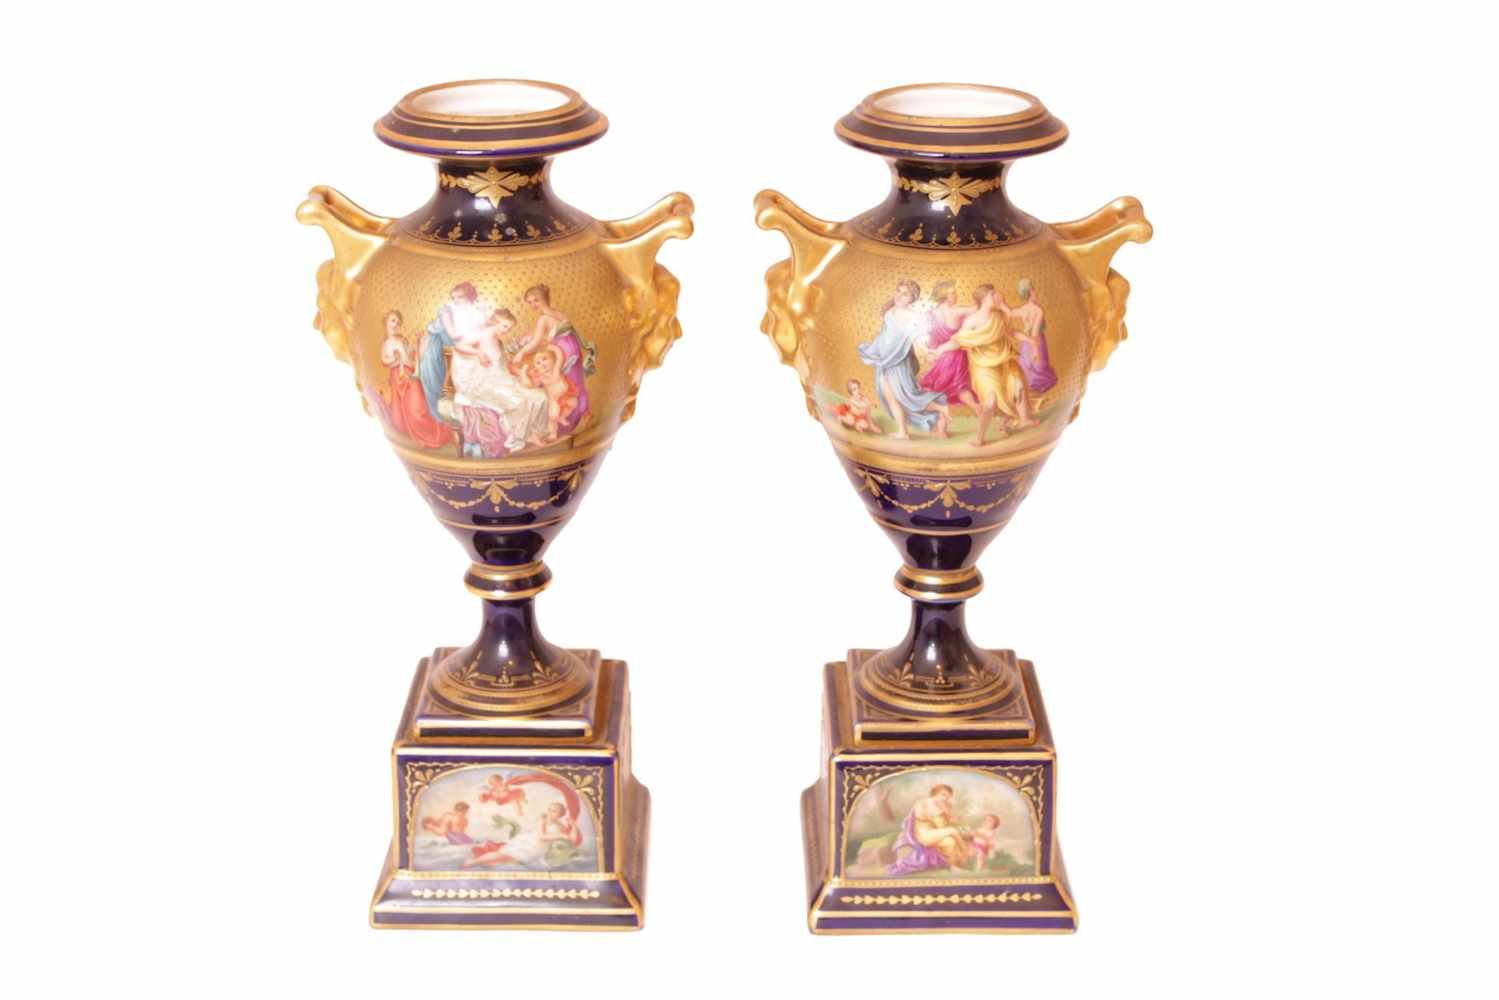 PAAR VASEN Porzellanmanufaktur Augarten, Porzellan, mythologische Szenenbemalung auf goldenem